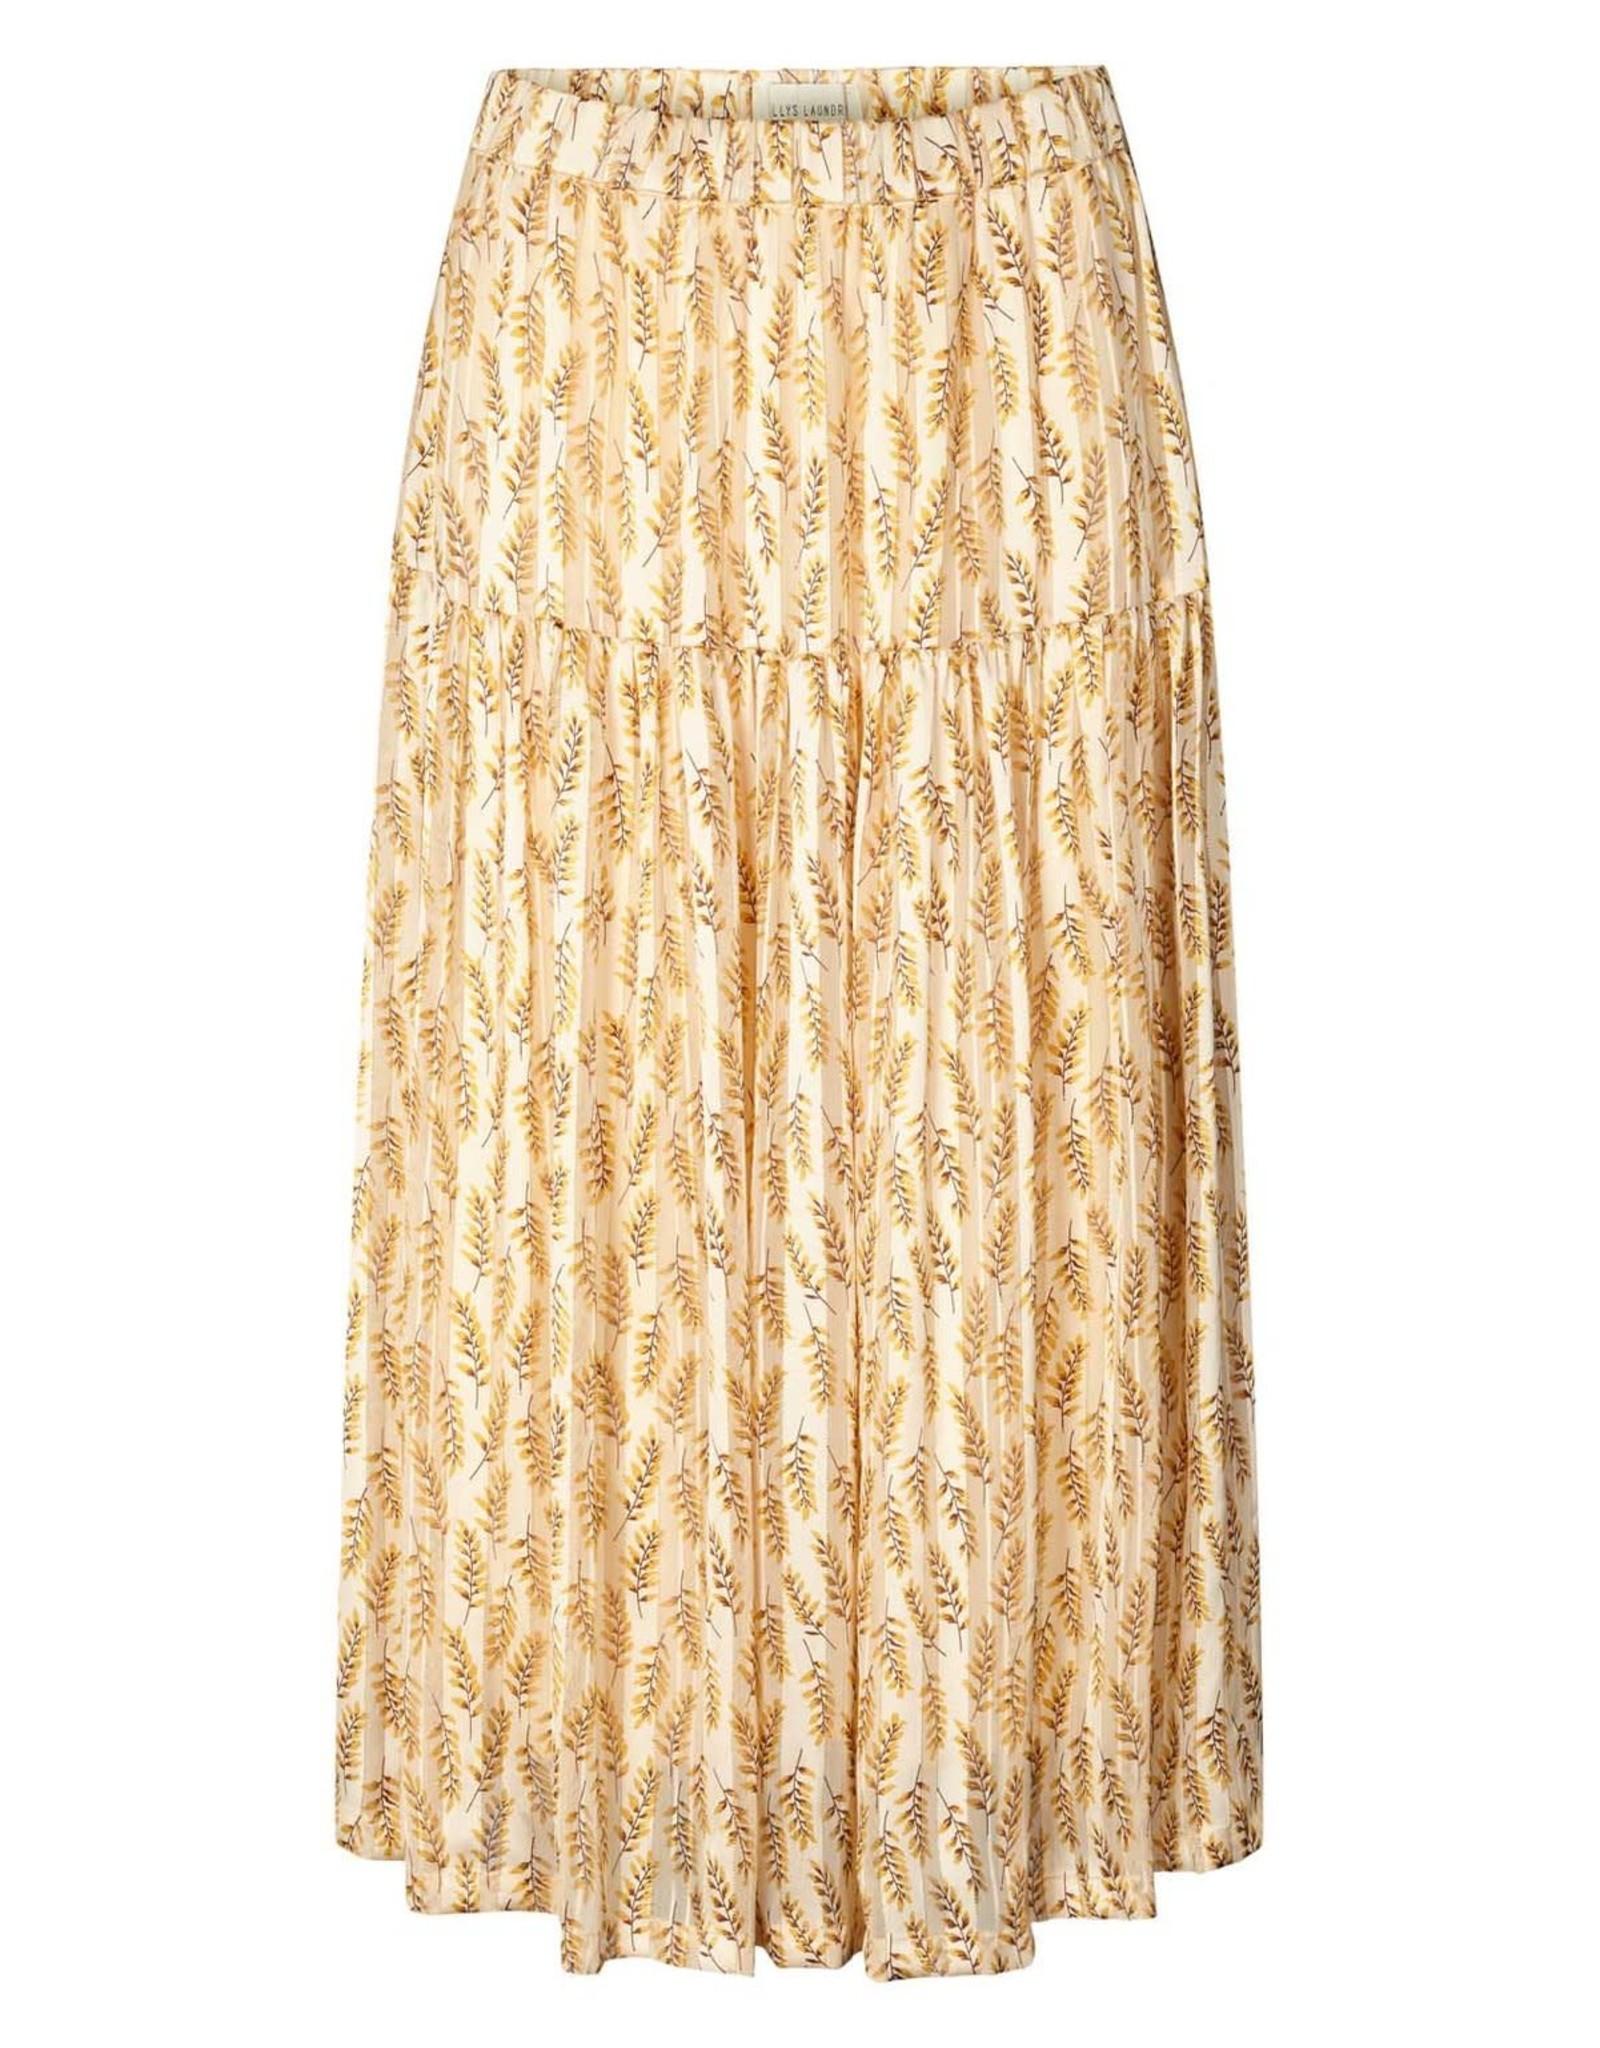 Lolly's Laundry Lollys Laundry - Cokko skirt yellow